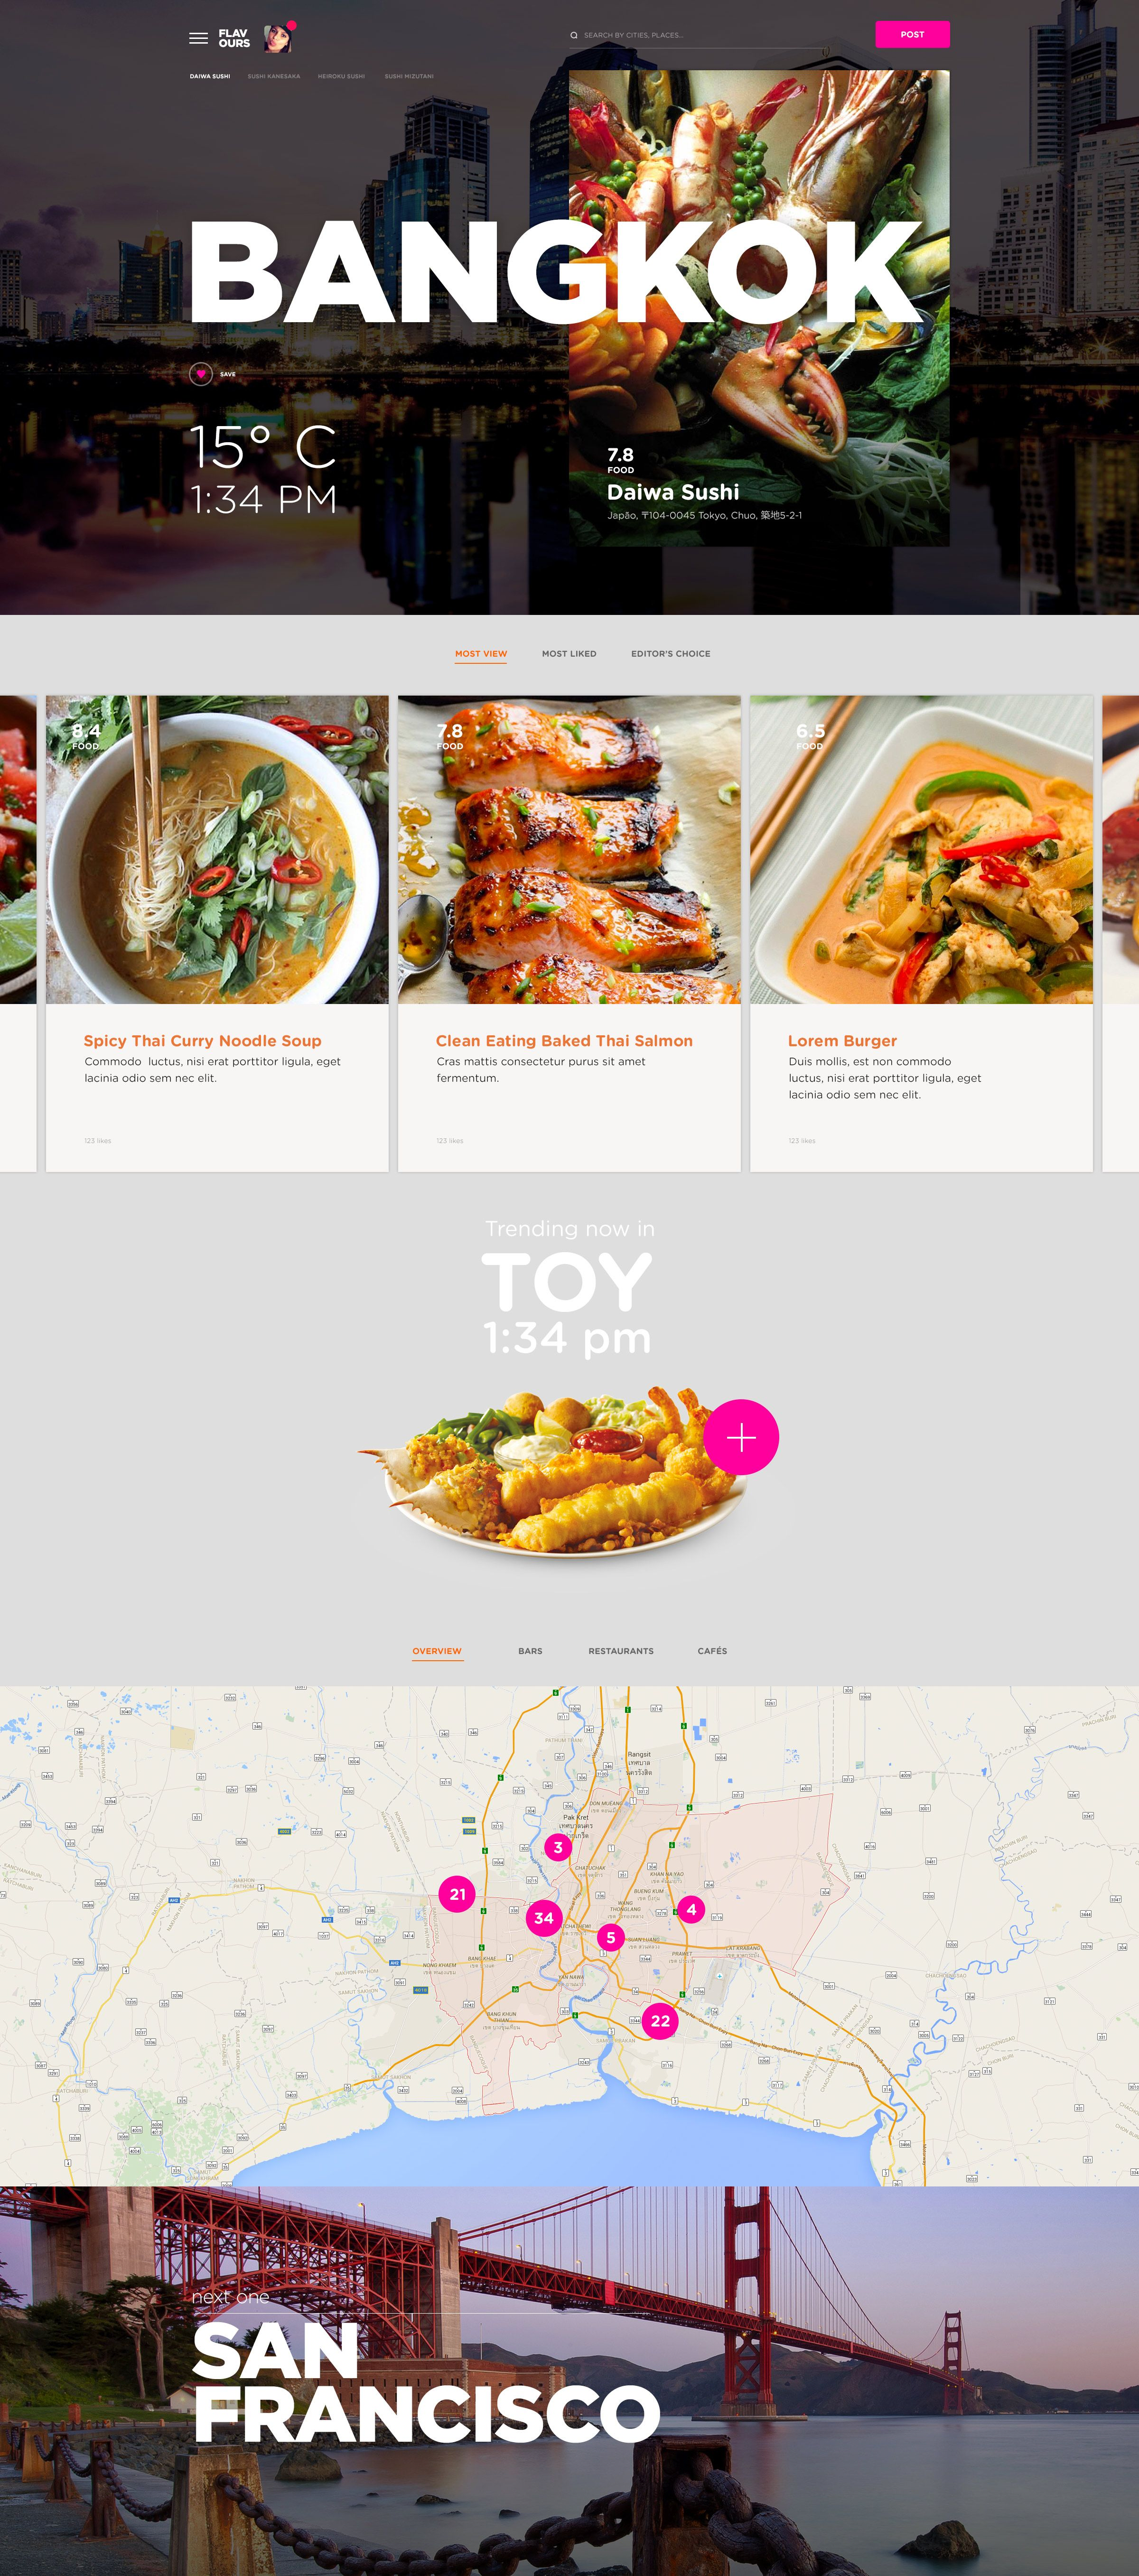 JP Teixeira - Product and Visual Designer